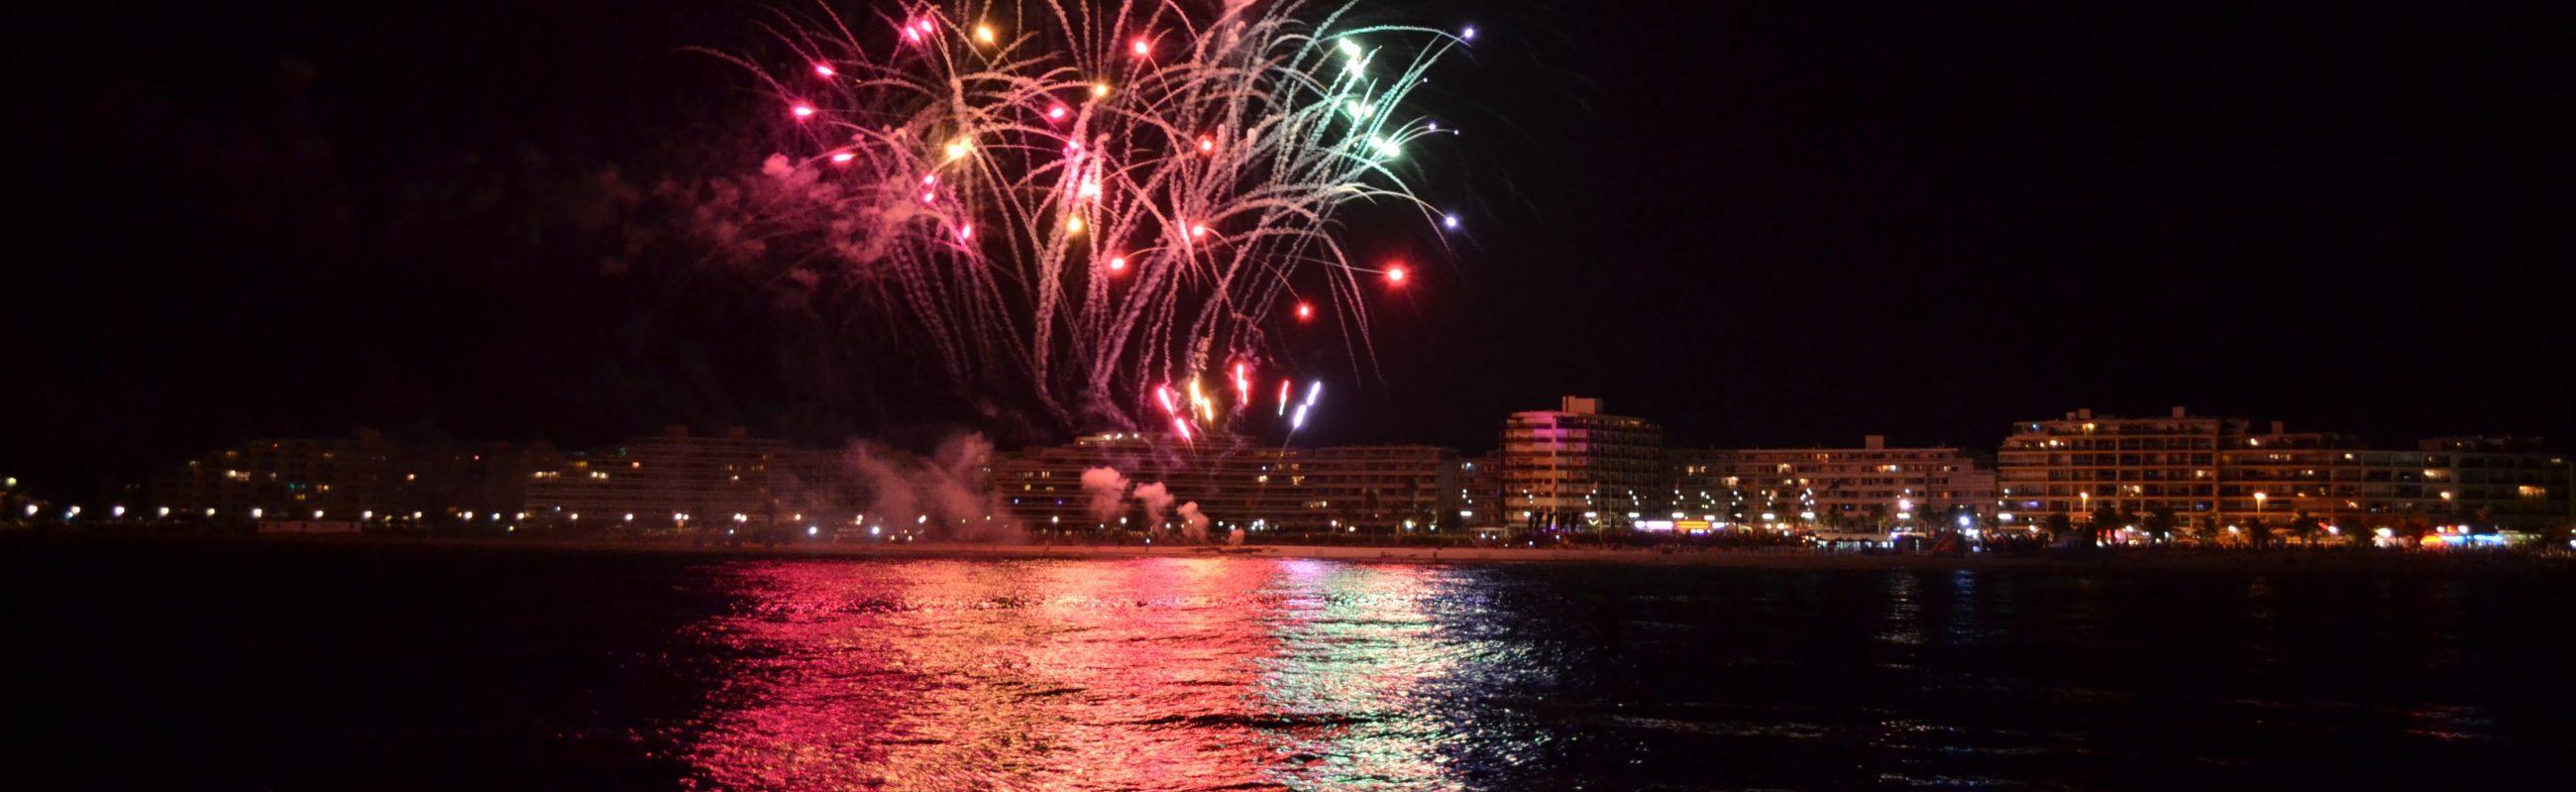 catamaran navivoile feu artifice du 13 juillet de canet en roussillon